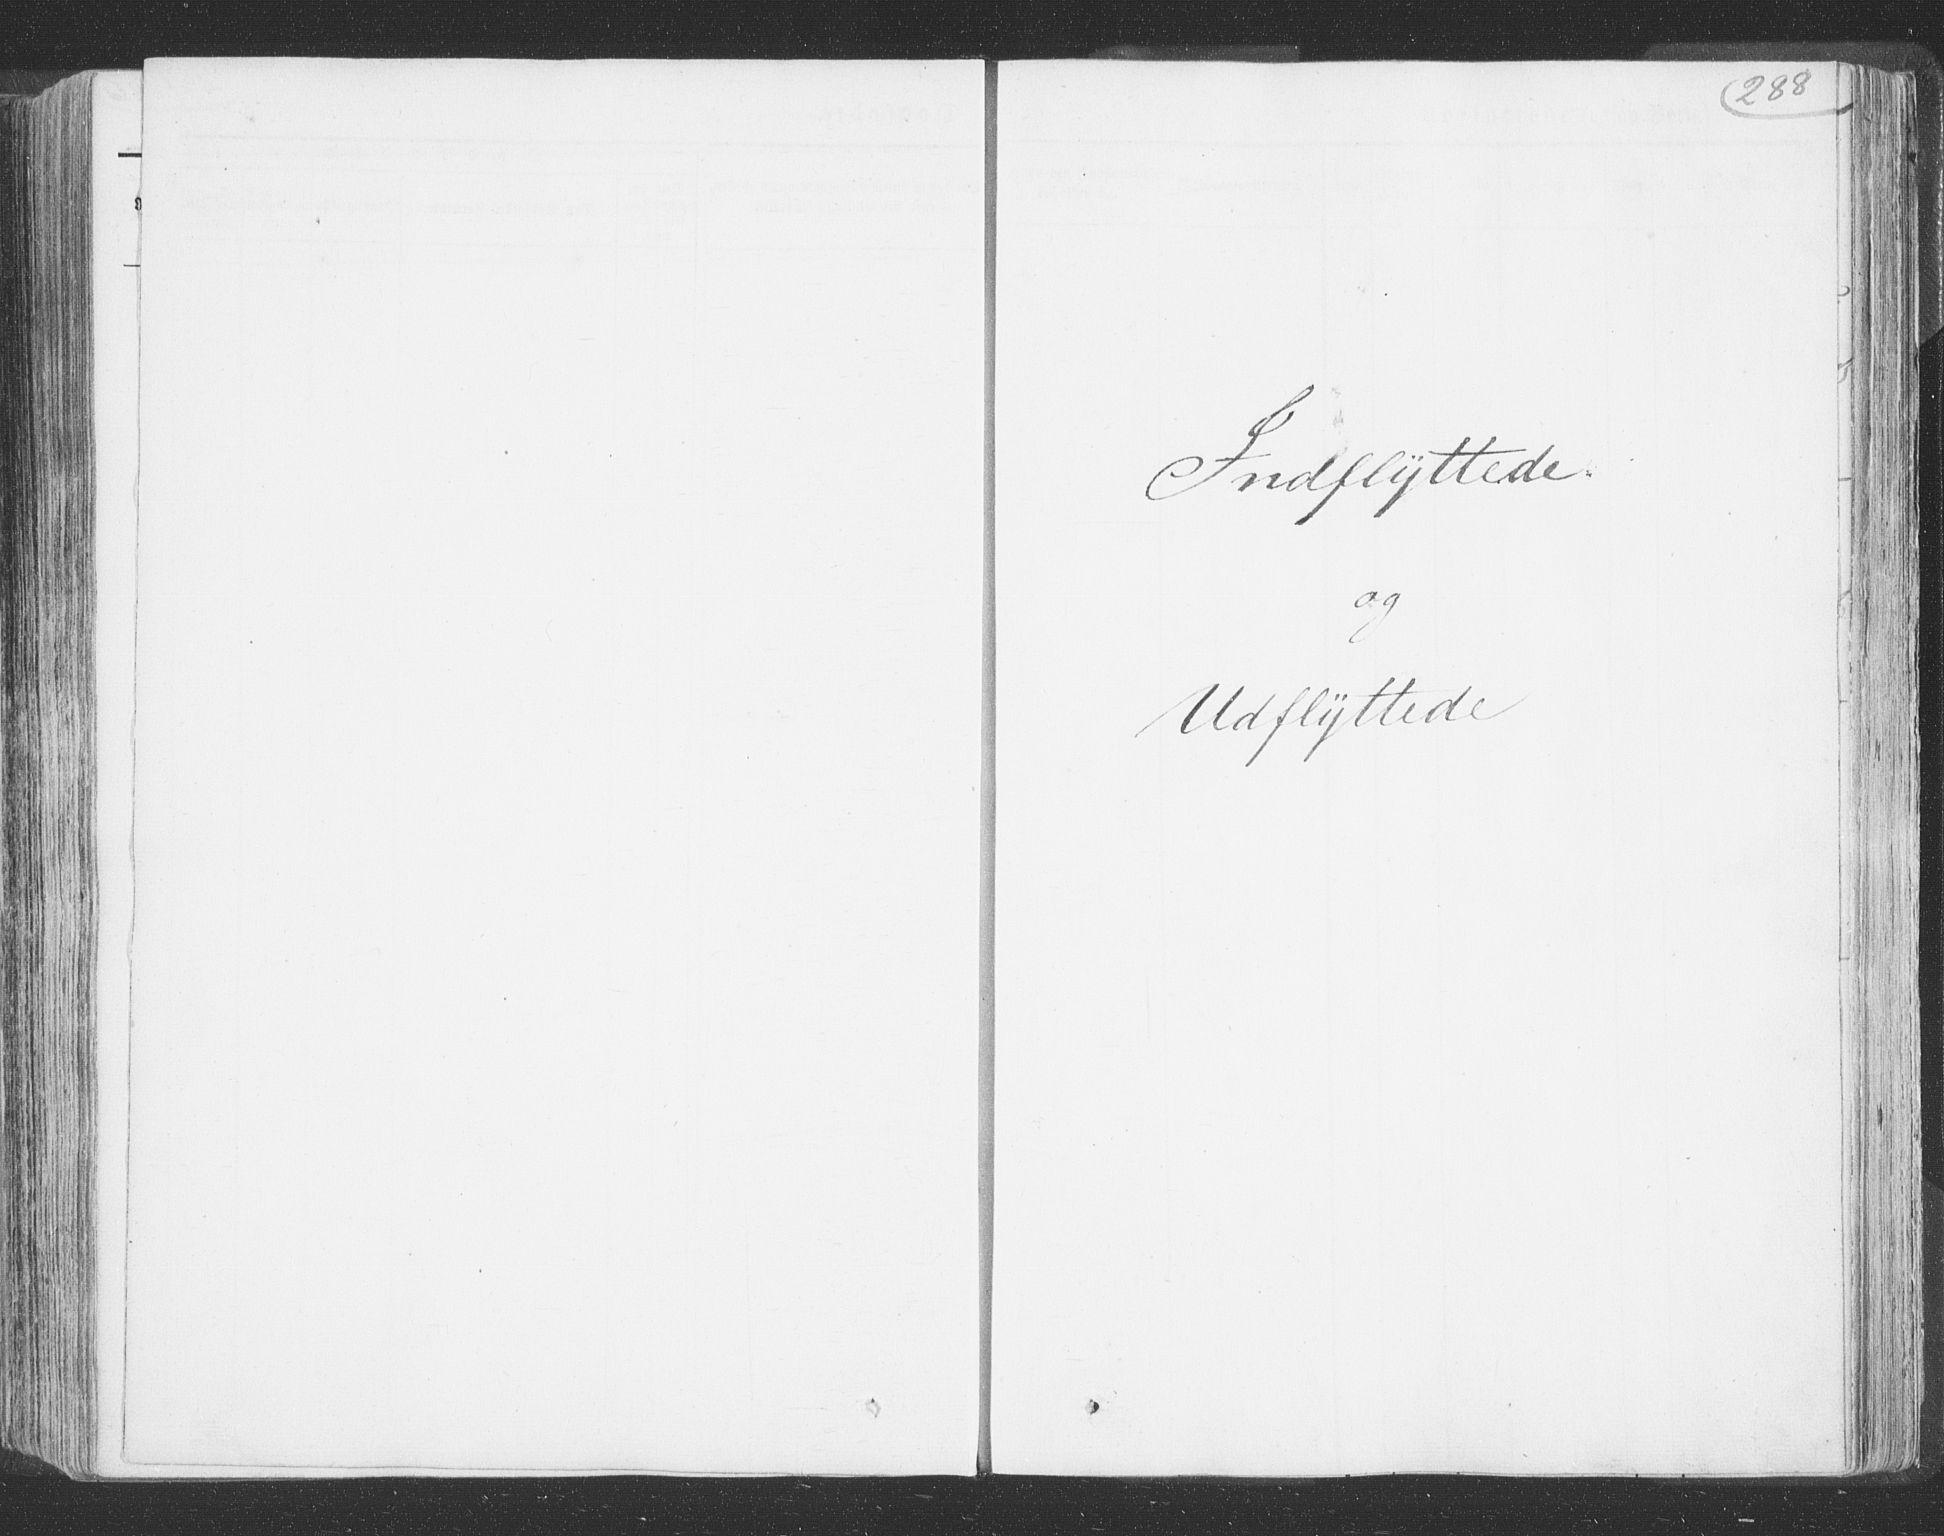 SATØ, Talvik sokneprestkontor, H/Ha/L0009kirke: Ministerialbok nr. 9, 1837-1852, s. 288